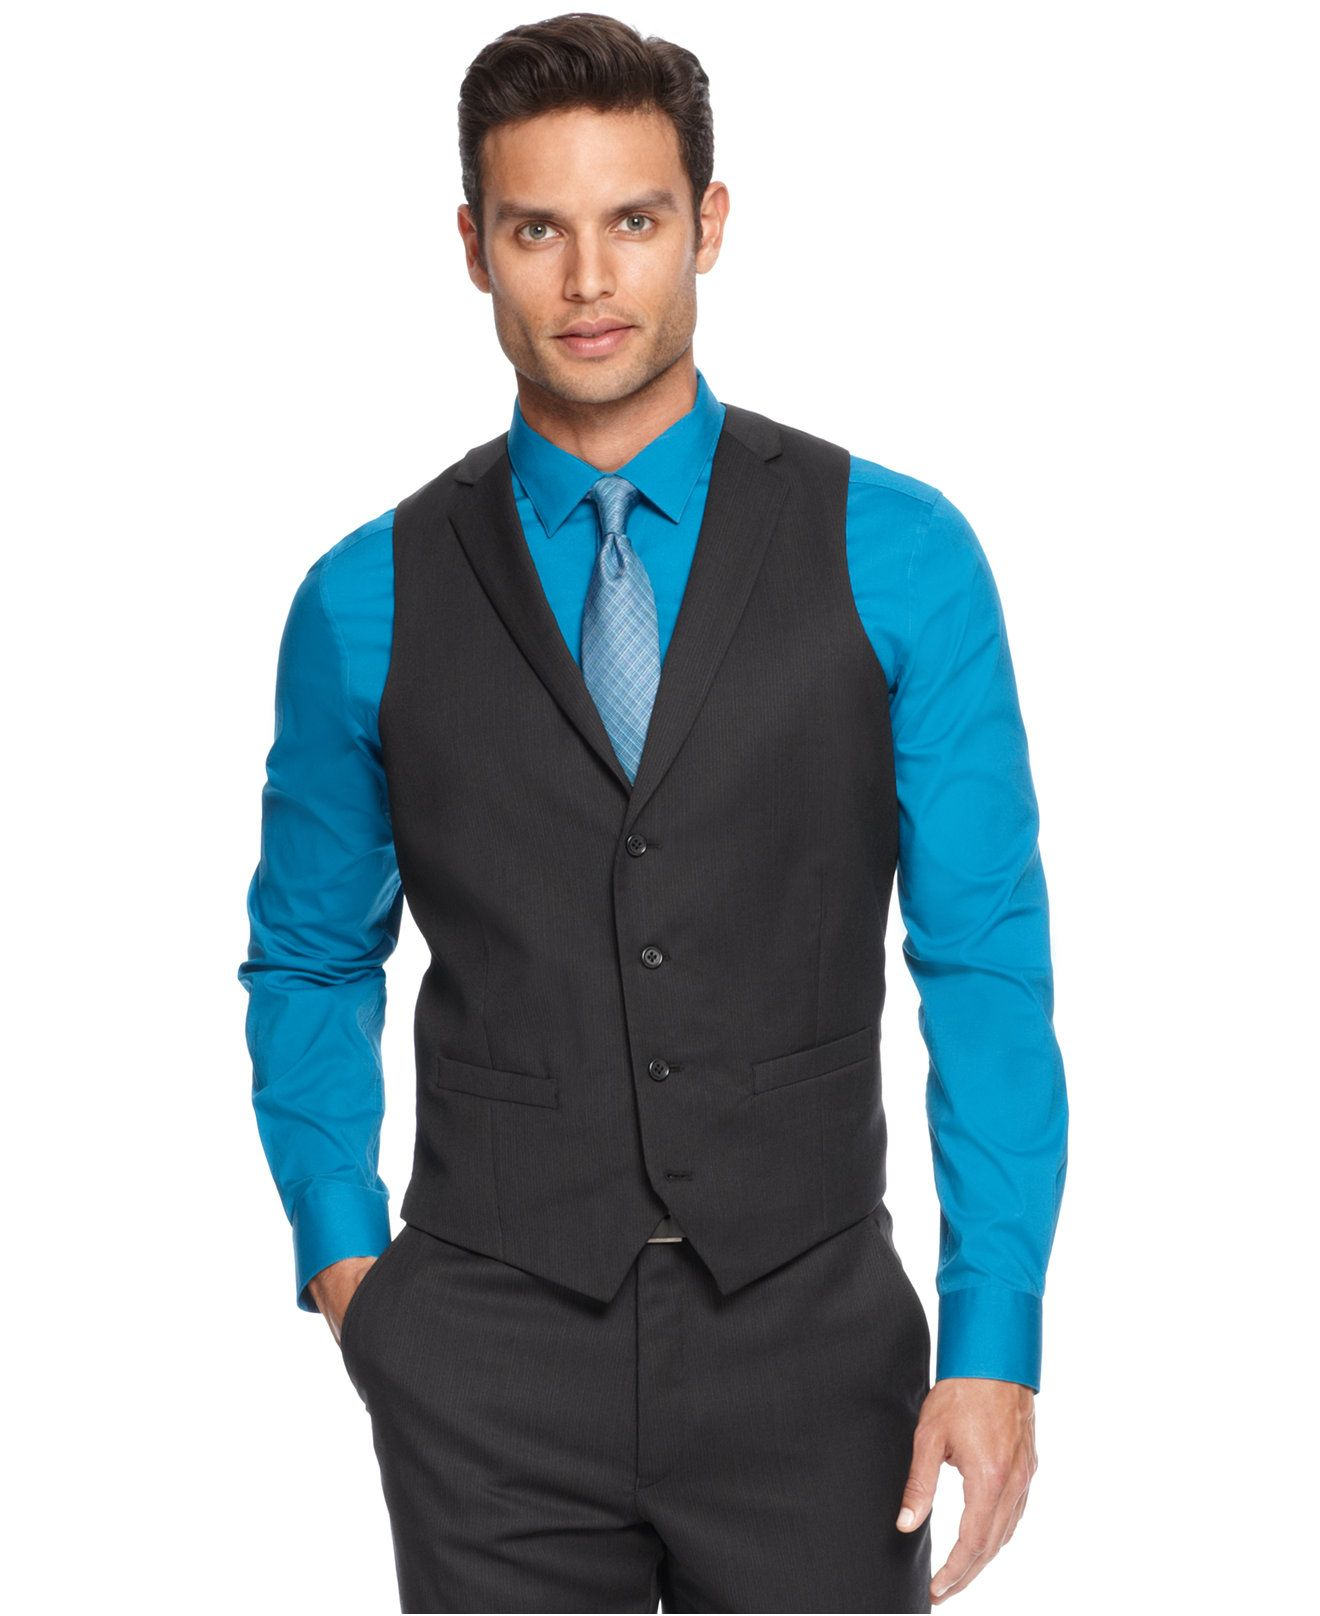 Blue dress shirt and black vest | Blue Fashion hits